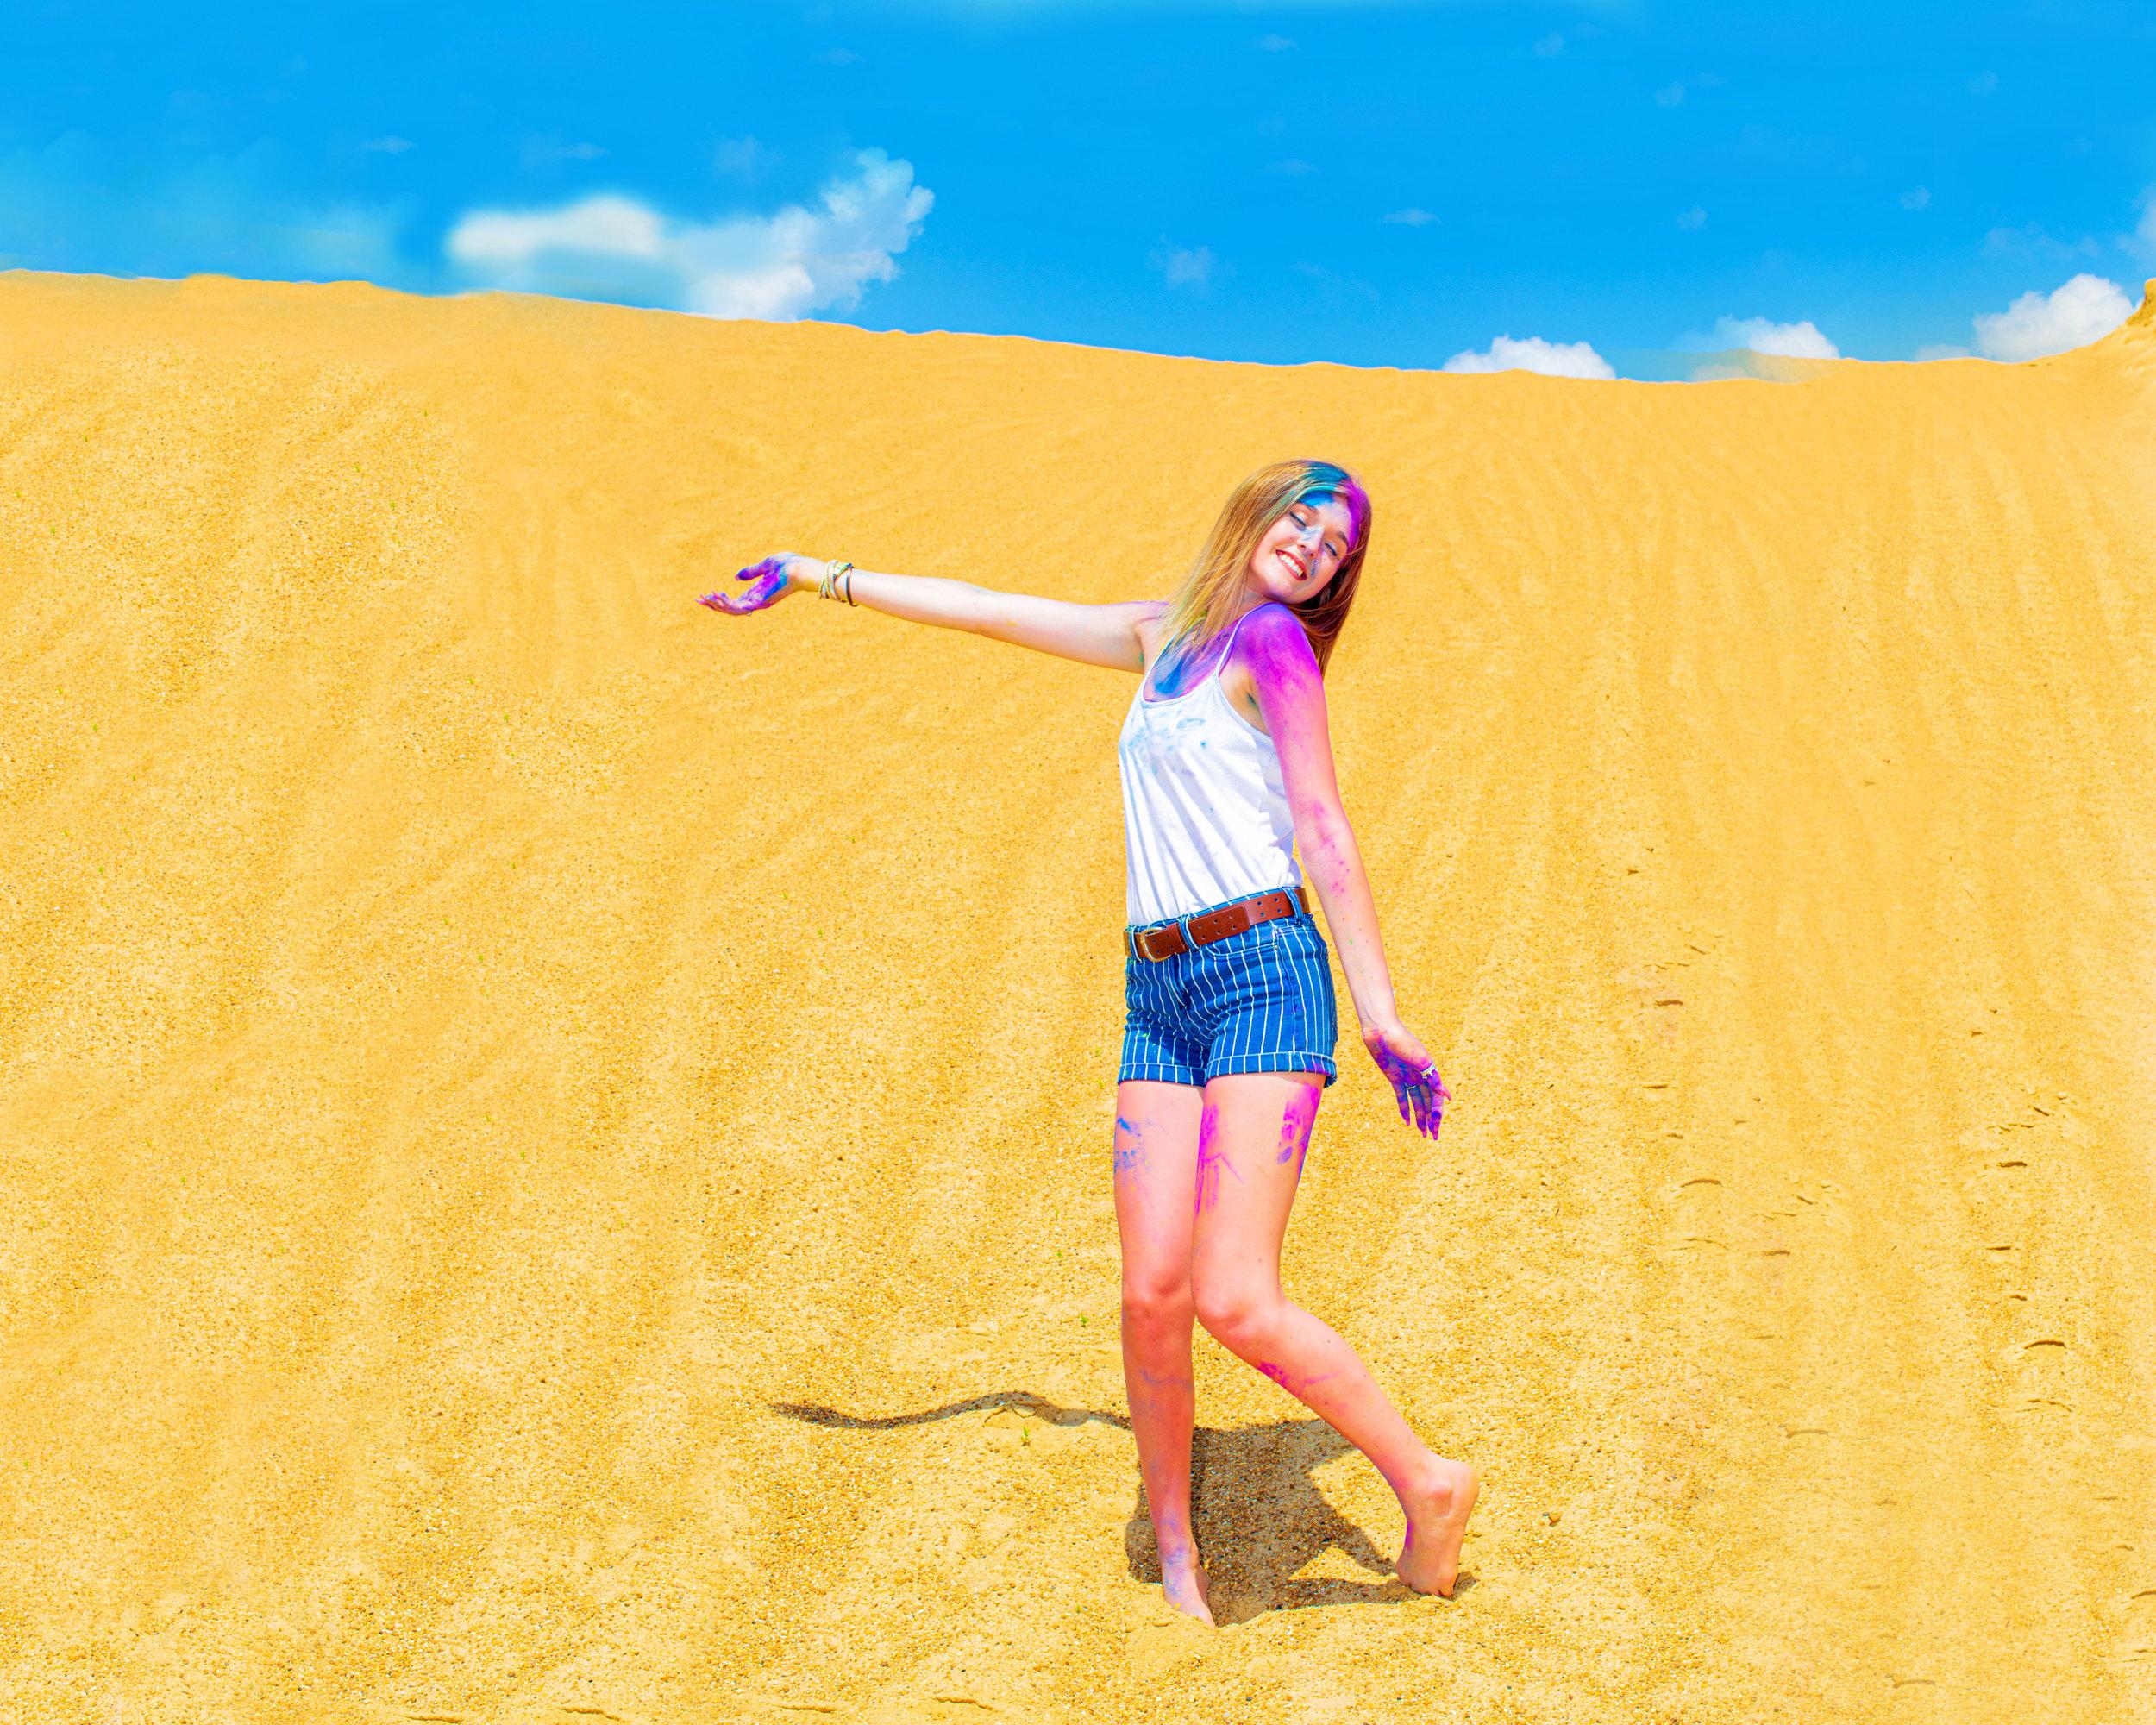 Laura Beth Bailey - LauraBailey-SydniRuddell-014.jpg